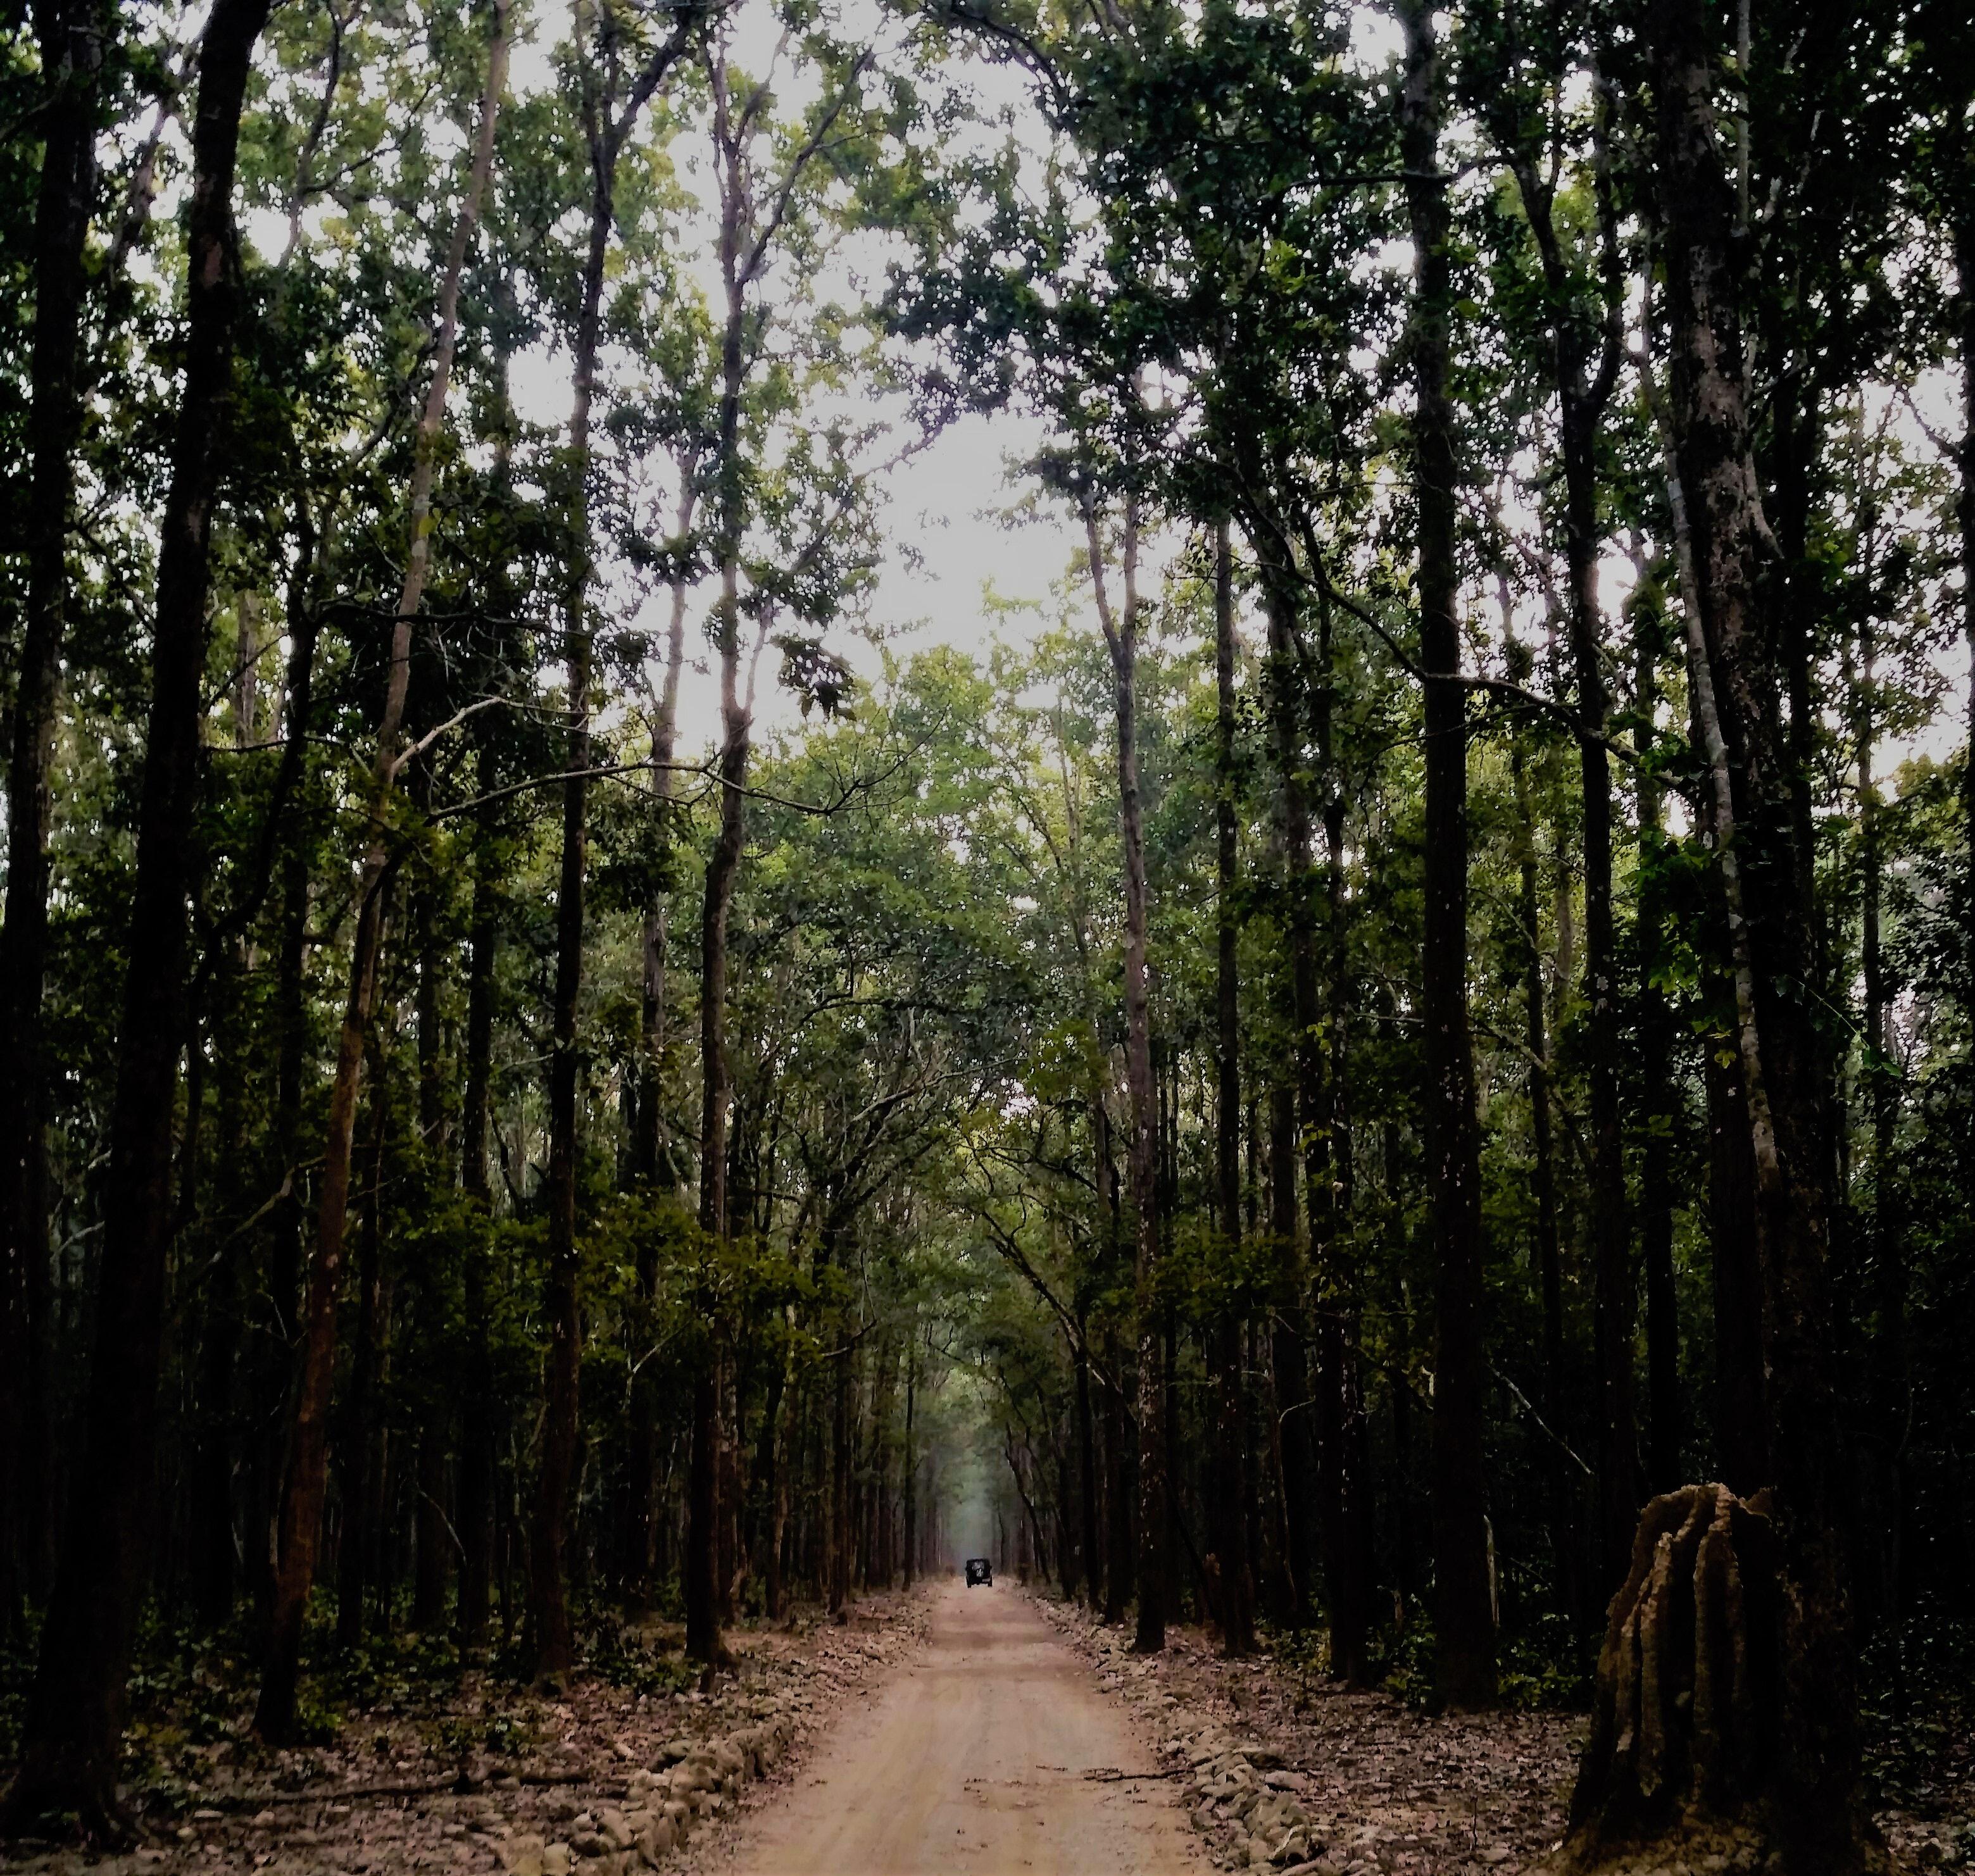 Green Leaf Trees, Car, Daylight, Dirt road, Environment, HQ Photo